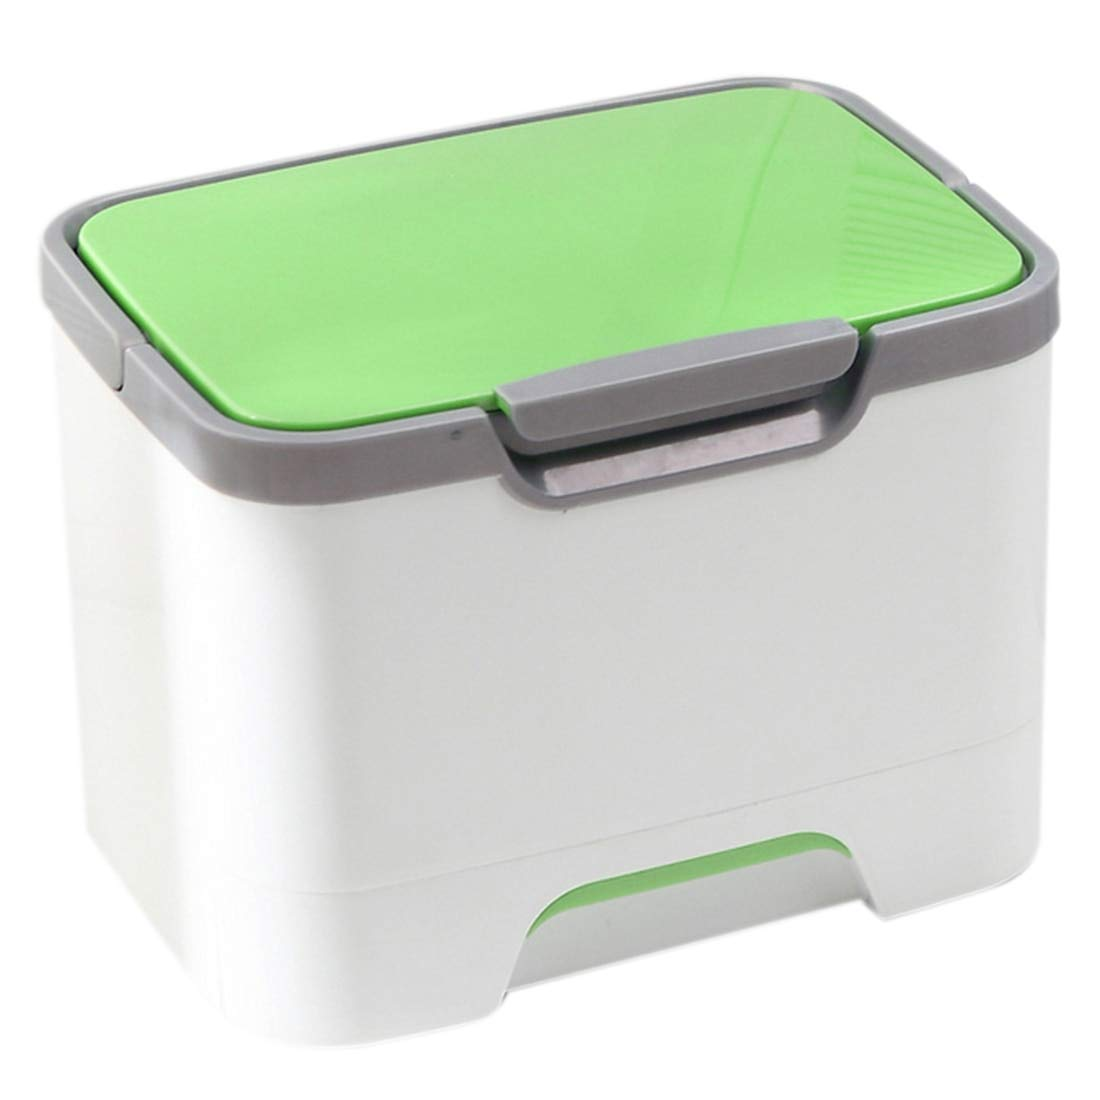 VT BigHome Household Multi-Grid First Aid Kit Storage Box Multifunction Medicine Storage Box Organizer Drug Pill Box Case